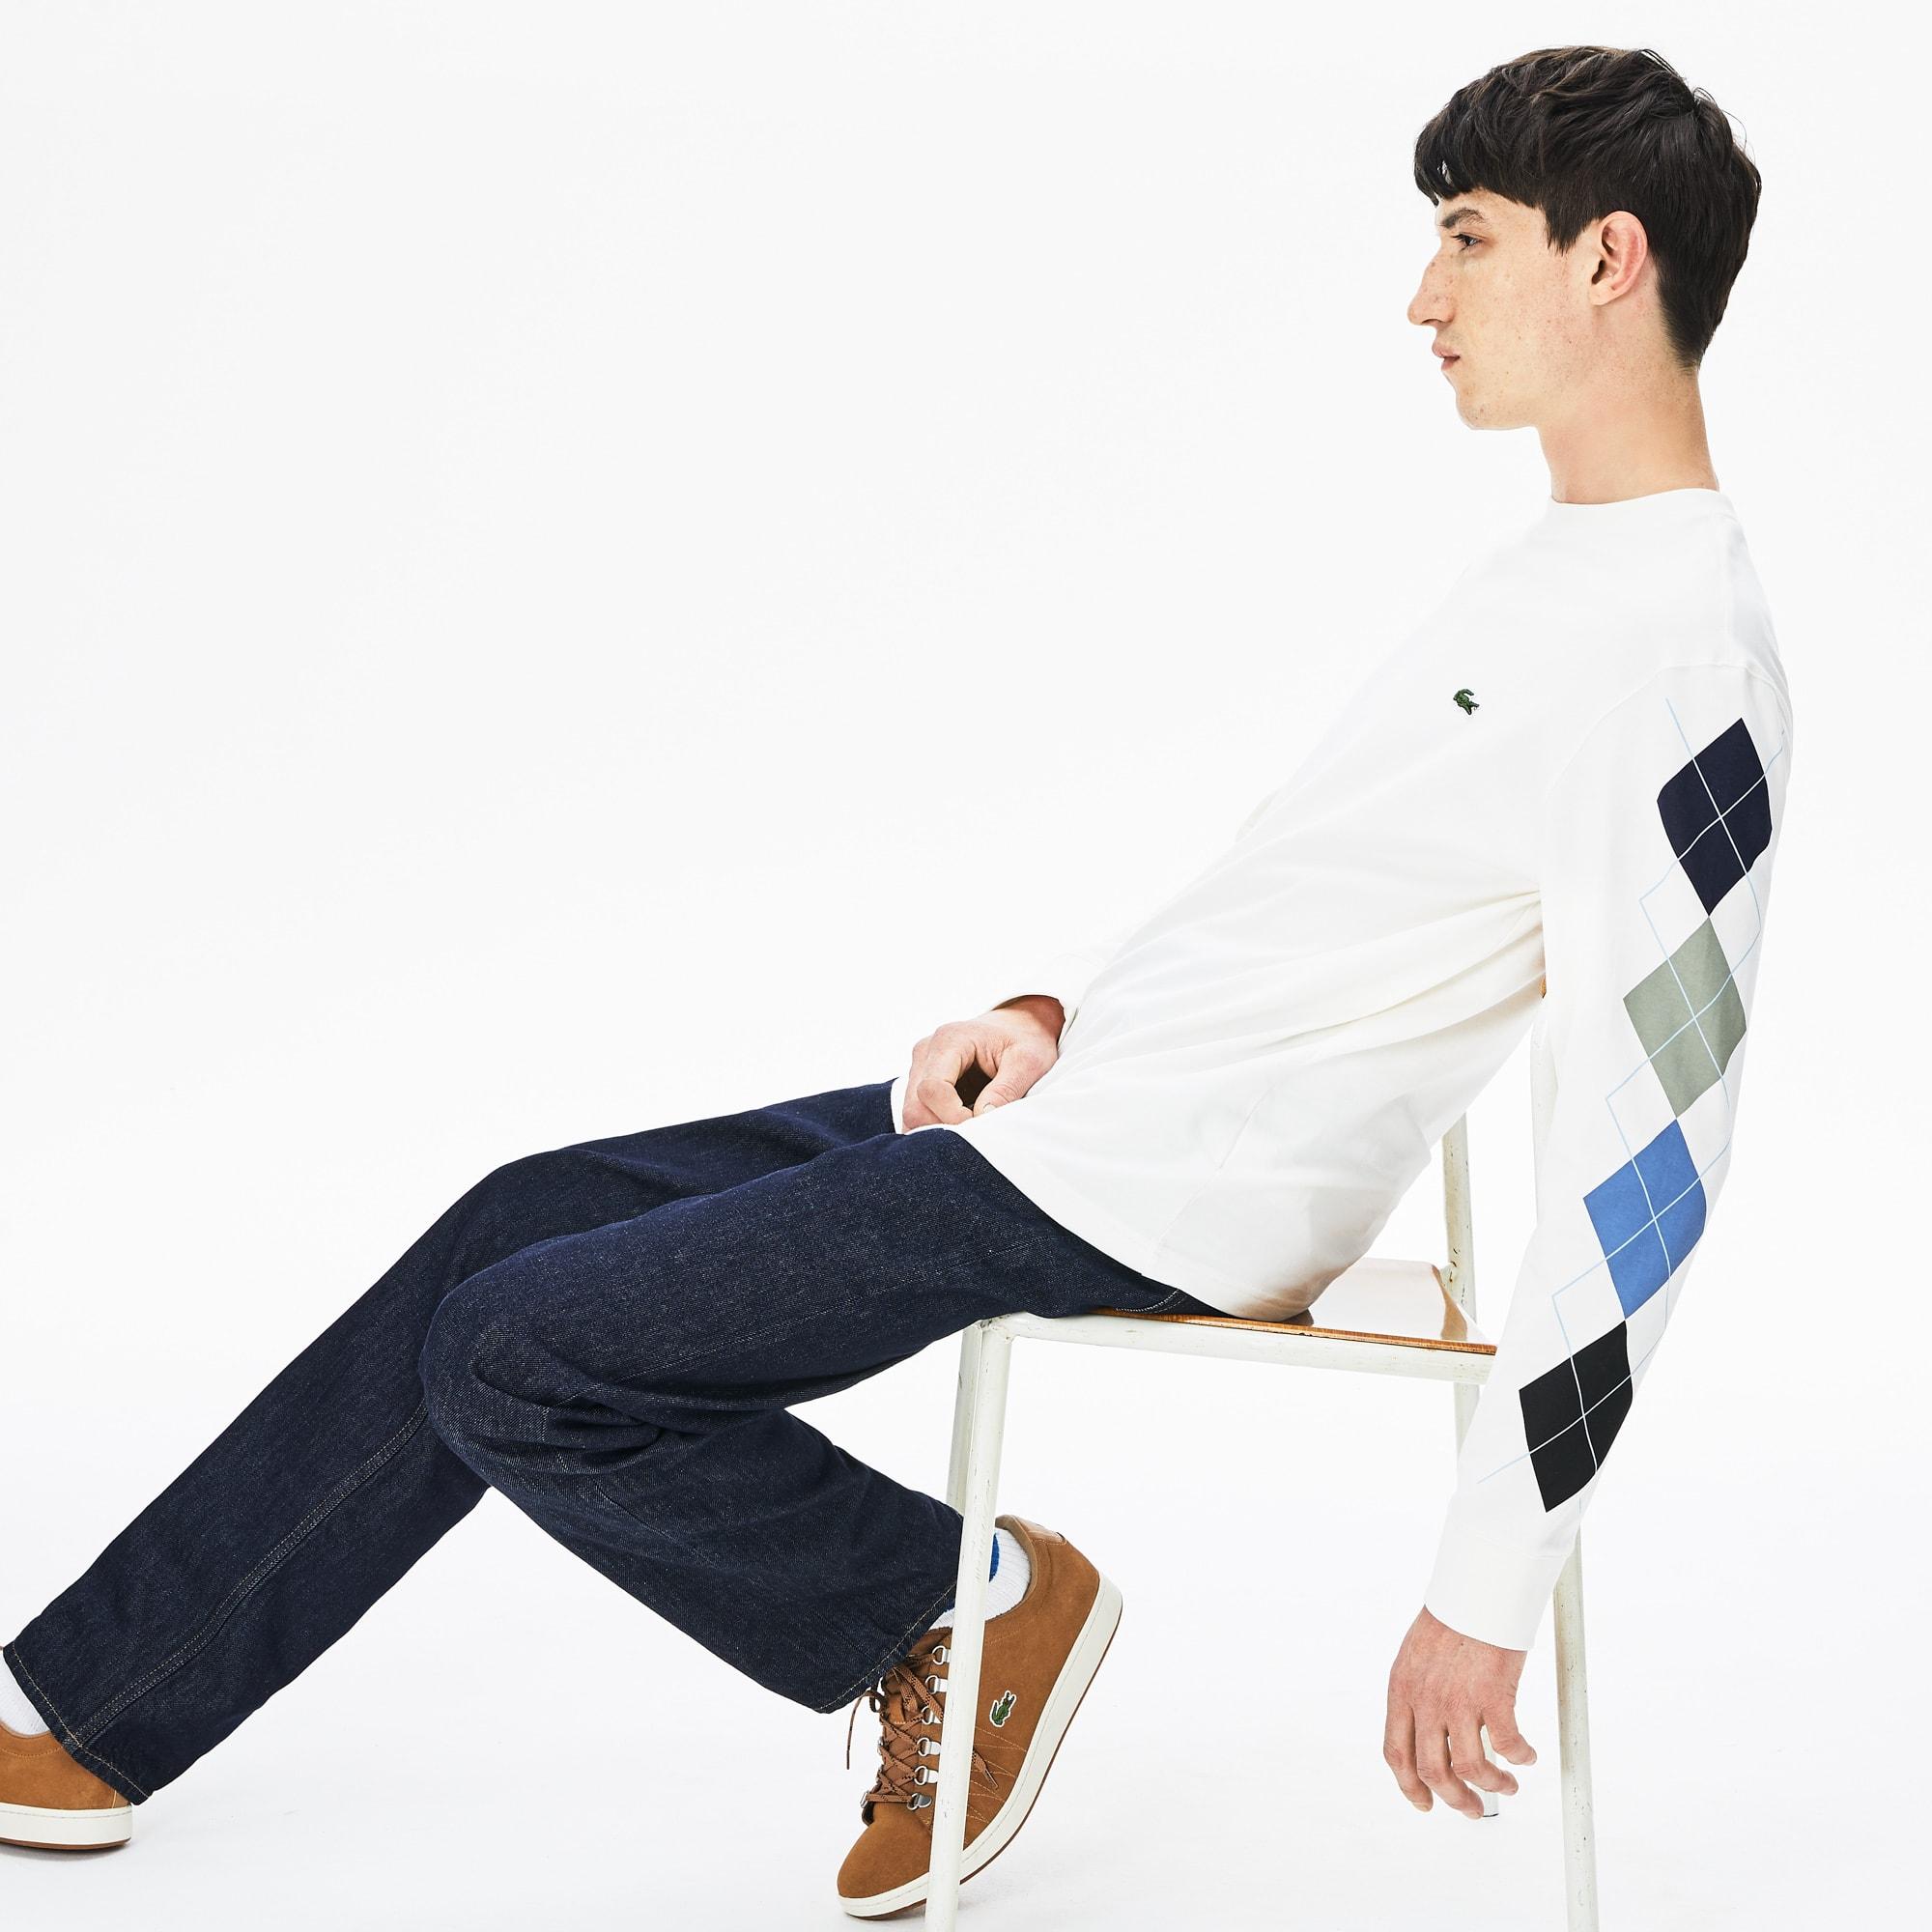 Lacoste Tops Men's Jacquard-Sleeve Cotton T-Shirt